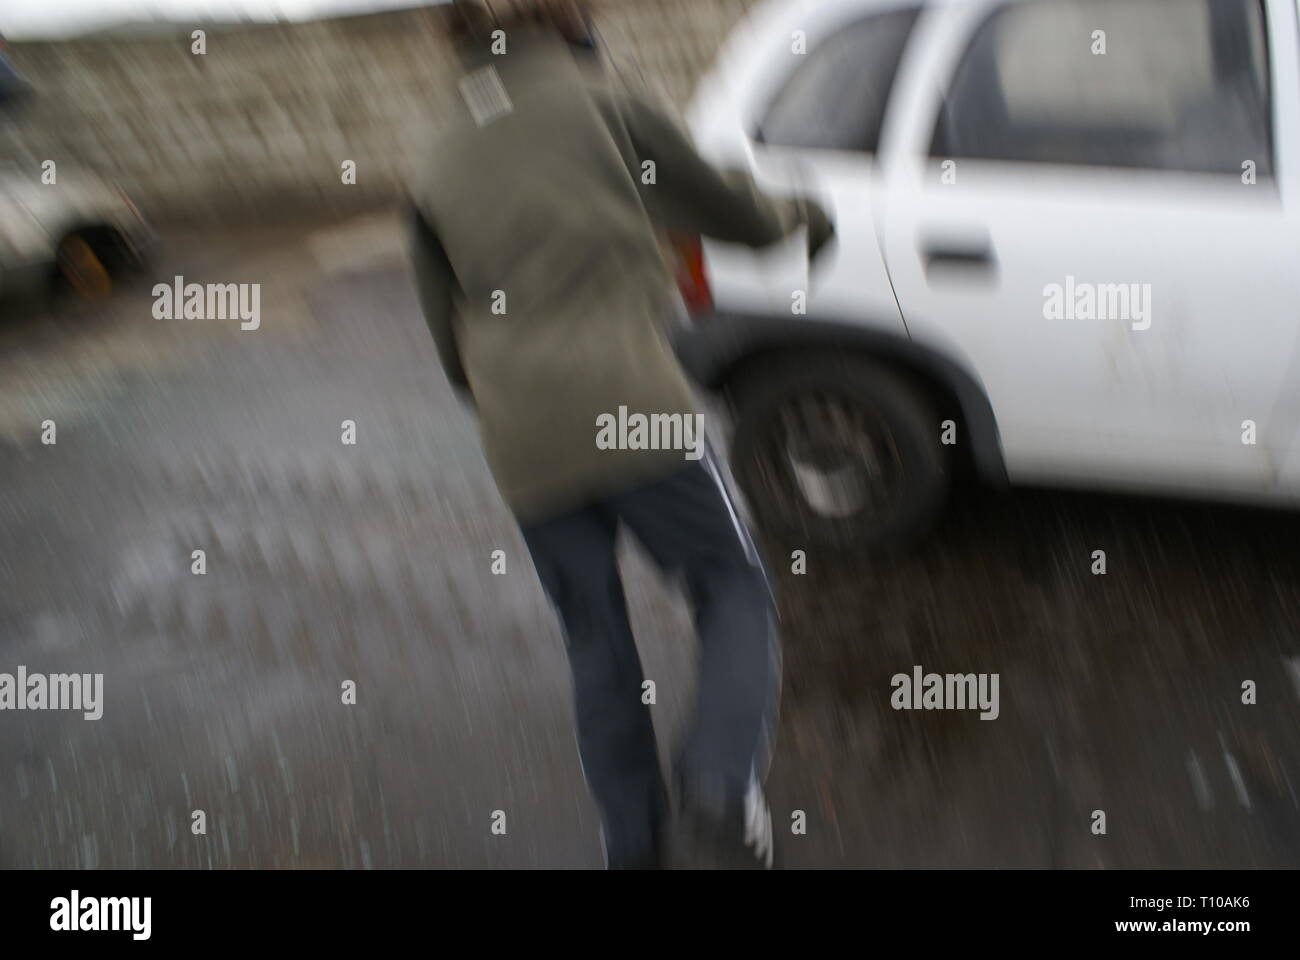 Car crime, TWOC, theft of motor vehicle - Stock Image